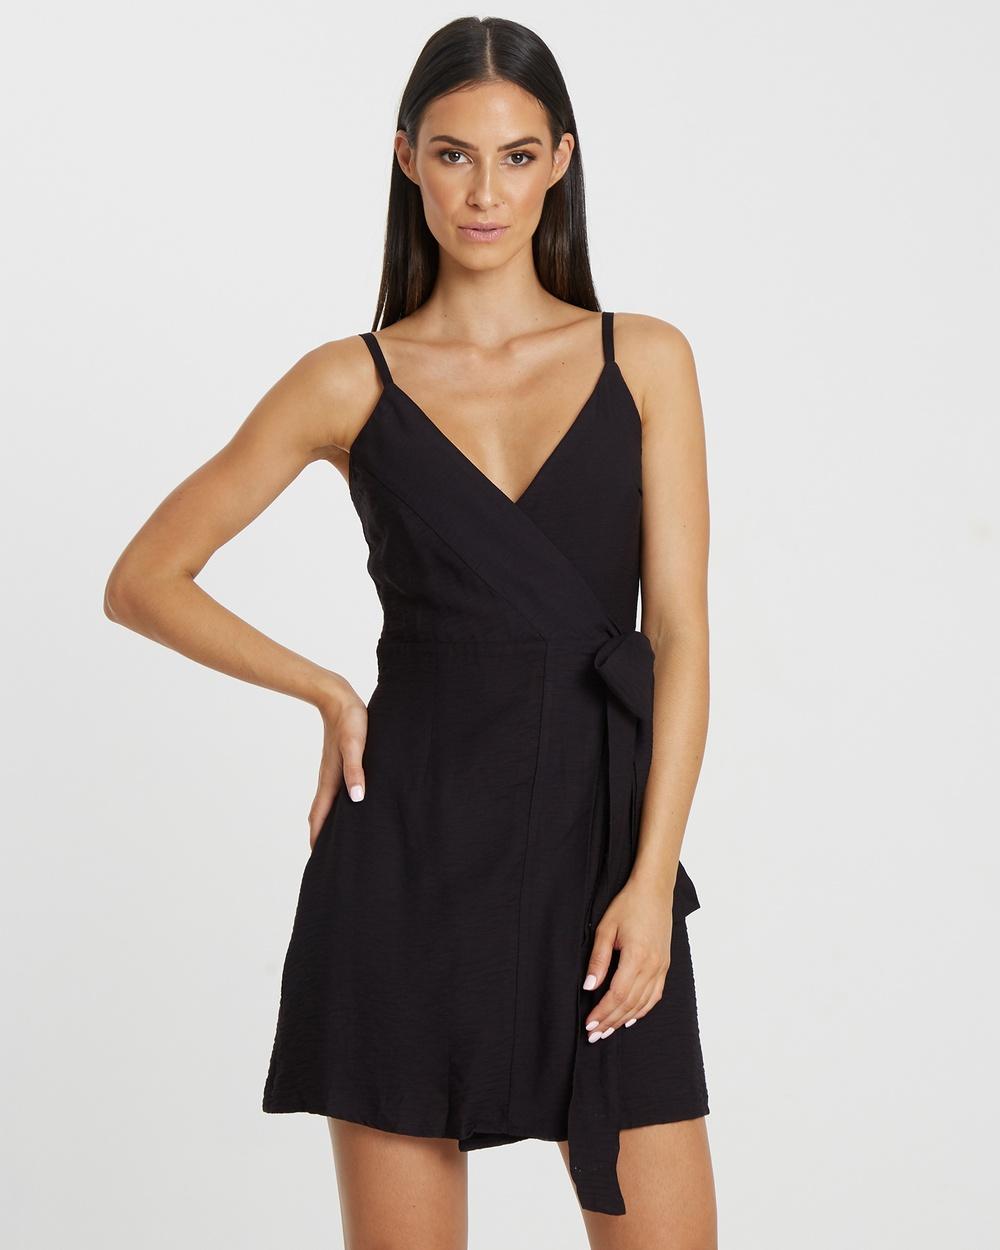 Buy Tussah Black Romana Wrap Dress -  shop Tussah dresses online